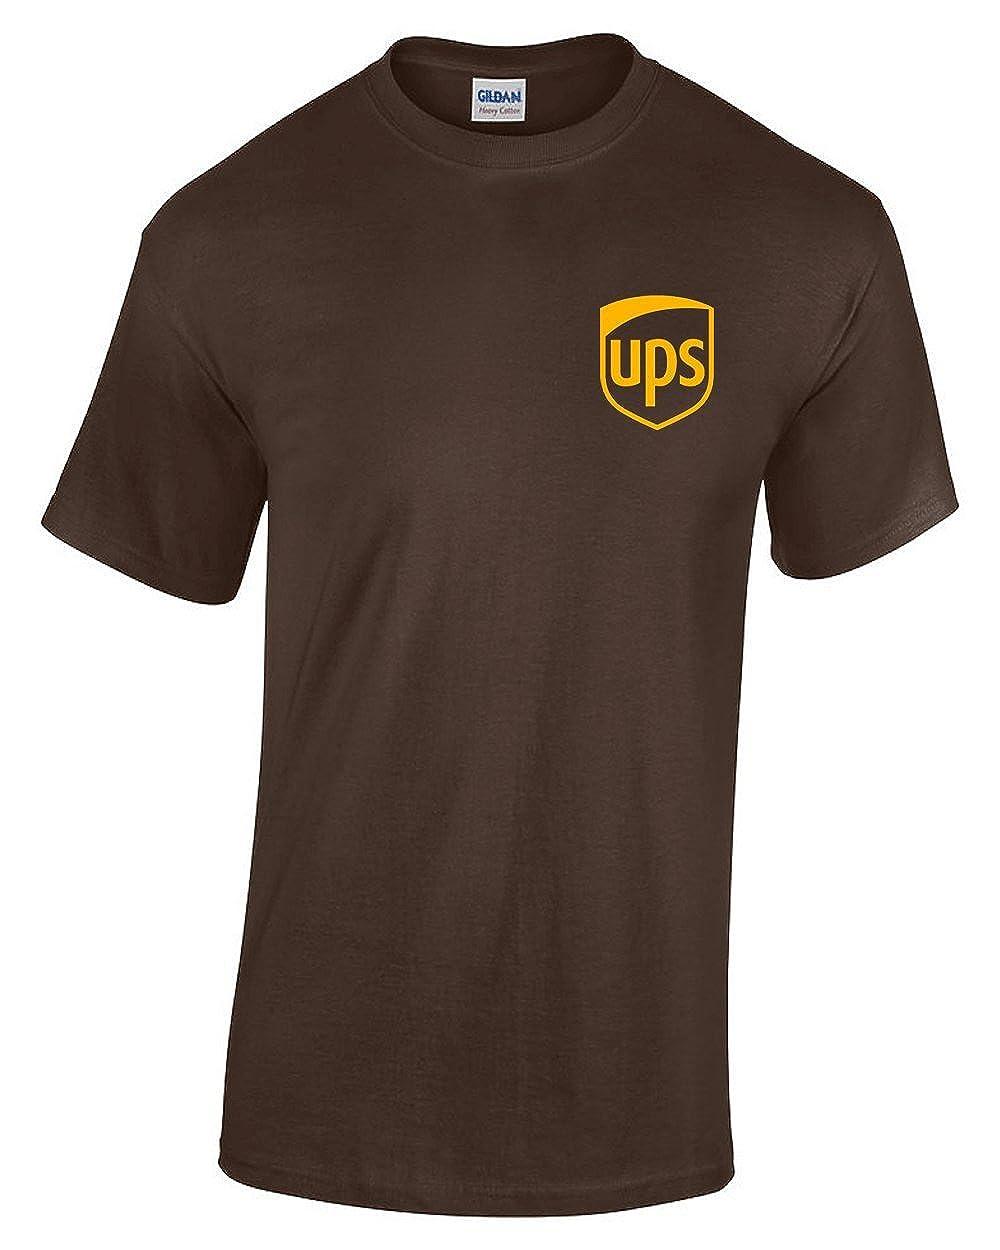 ee43918df United Parcel Service T-Shirt UPS T-Shirt Postal t-Shirt